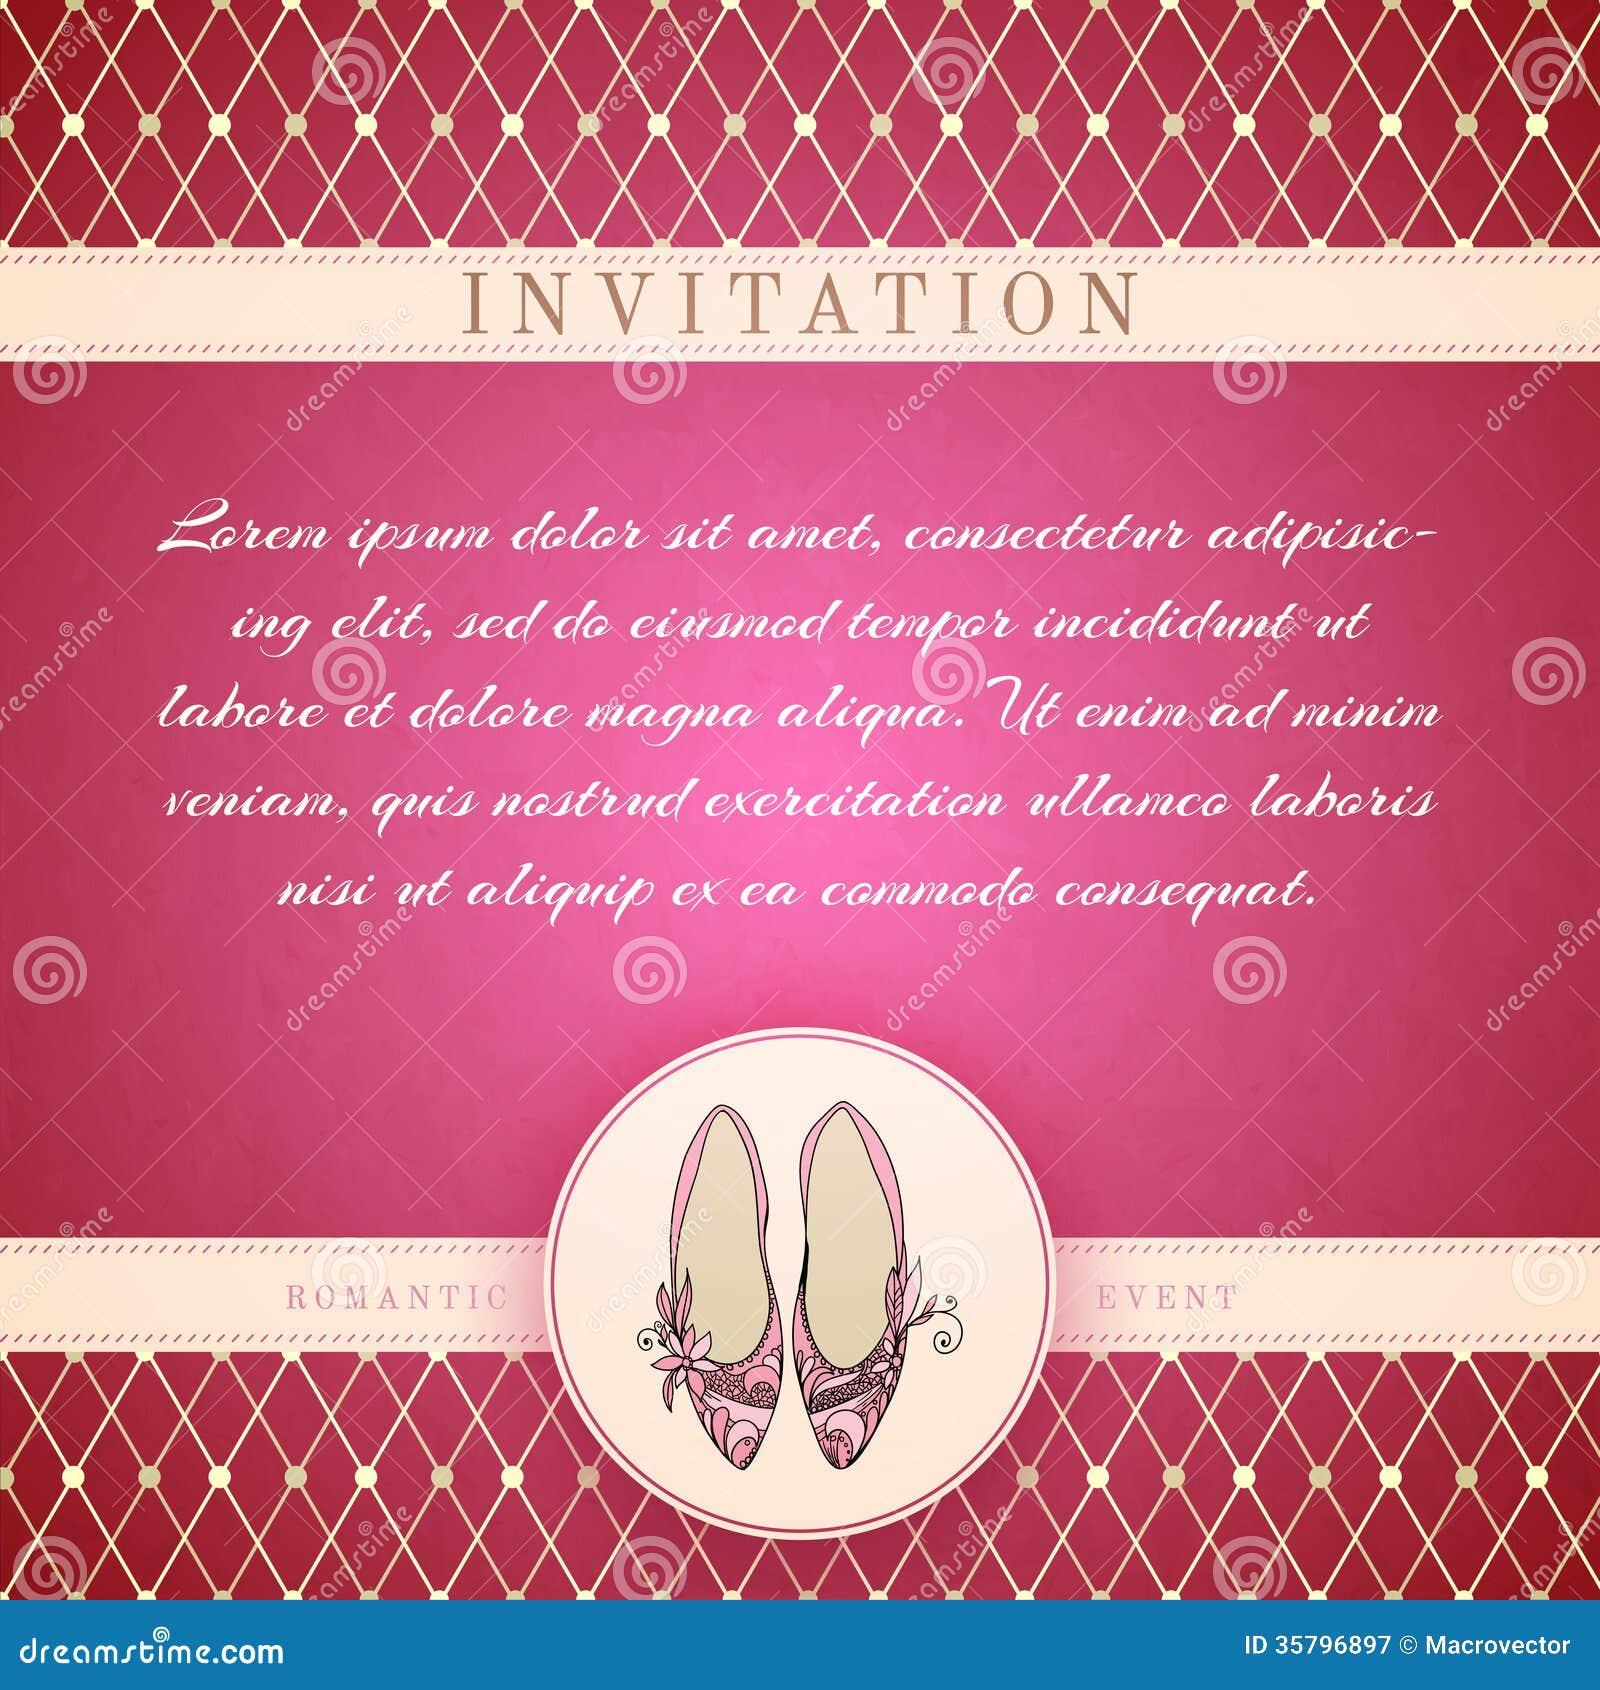 retro princess invitation template stock photo image 35457630 cinderella princess invitation template royalty stock photography